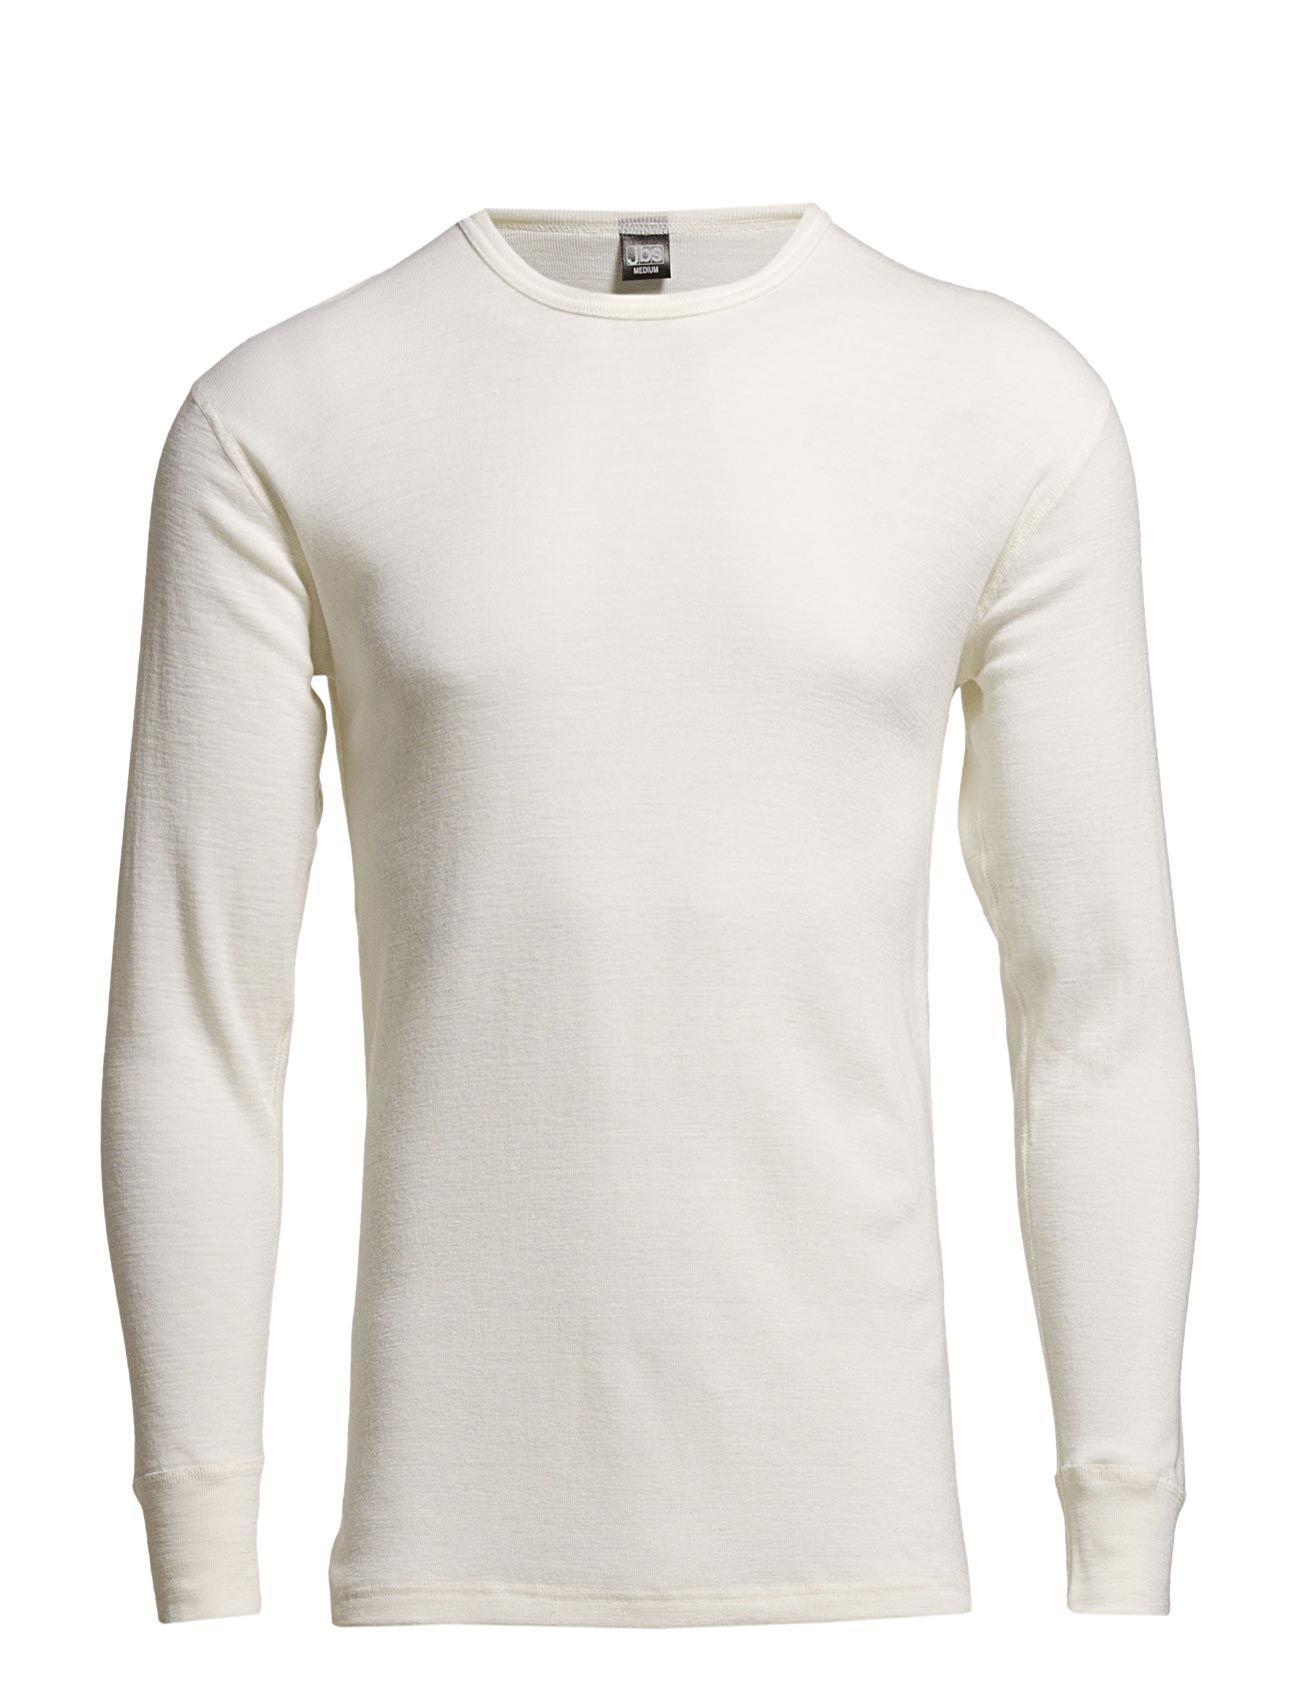 jbs – Jbs, t-shirt long sleeve på boozt.com dk